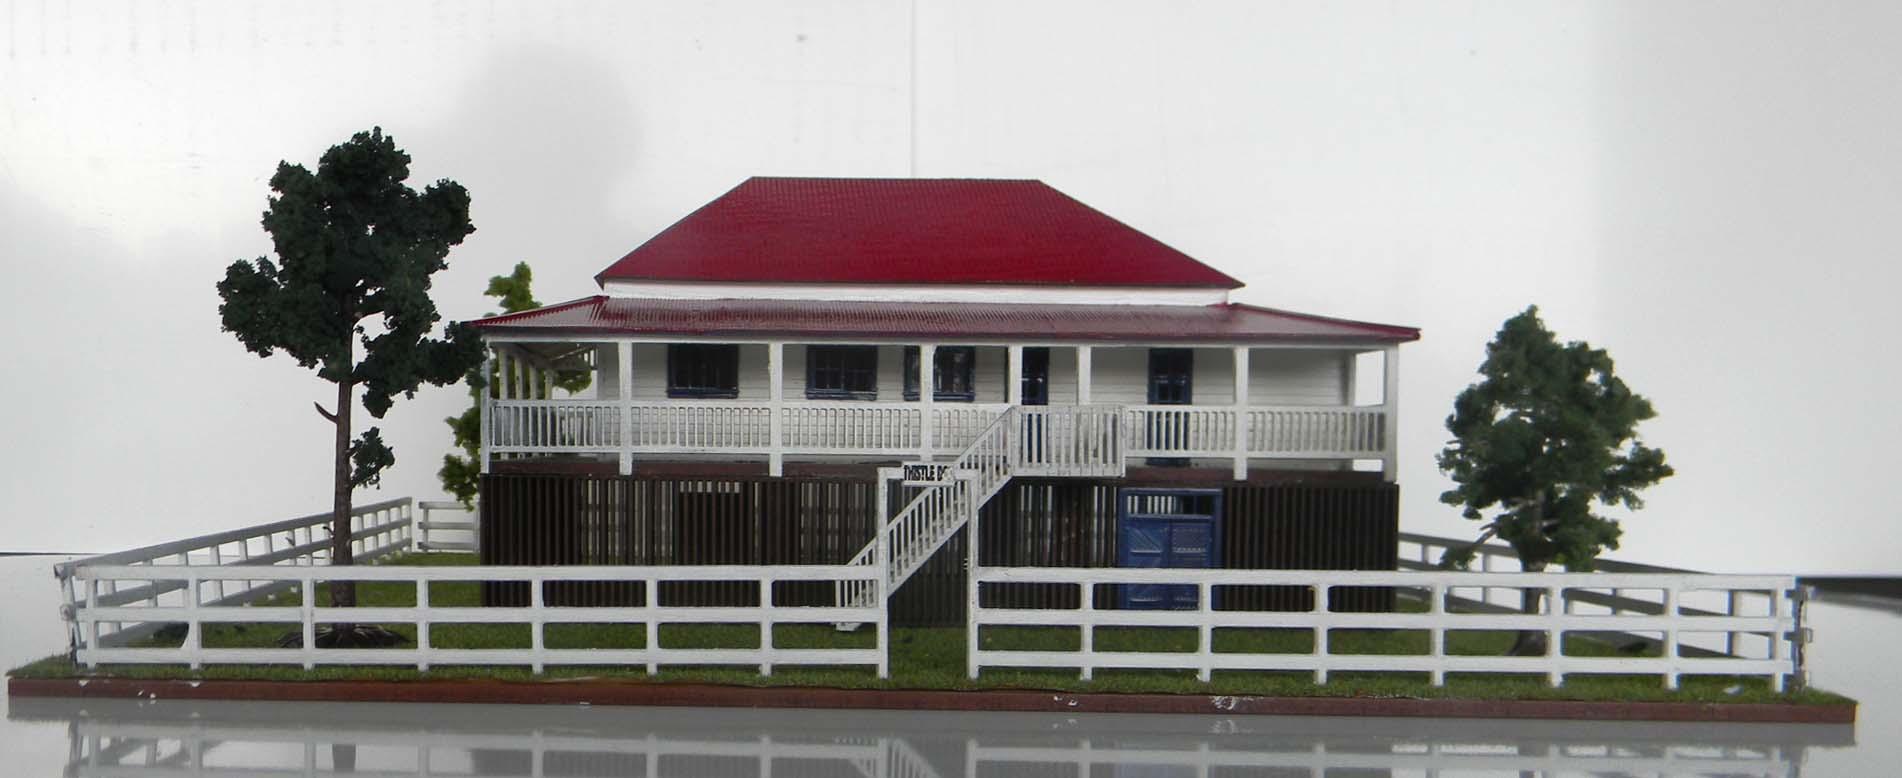 Queenslander style farm house high set model train buildings for Architecture models for sale